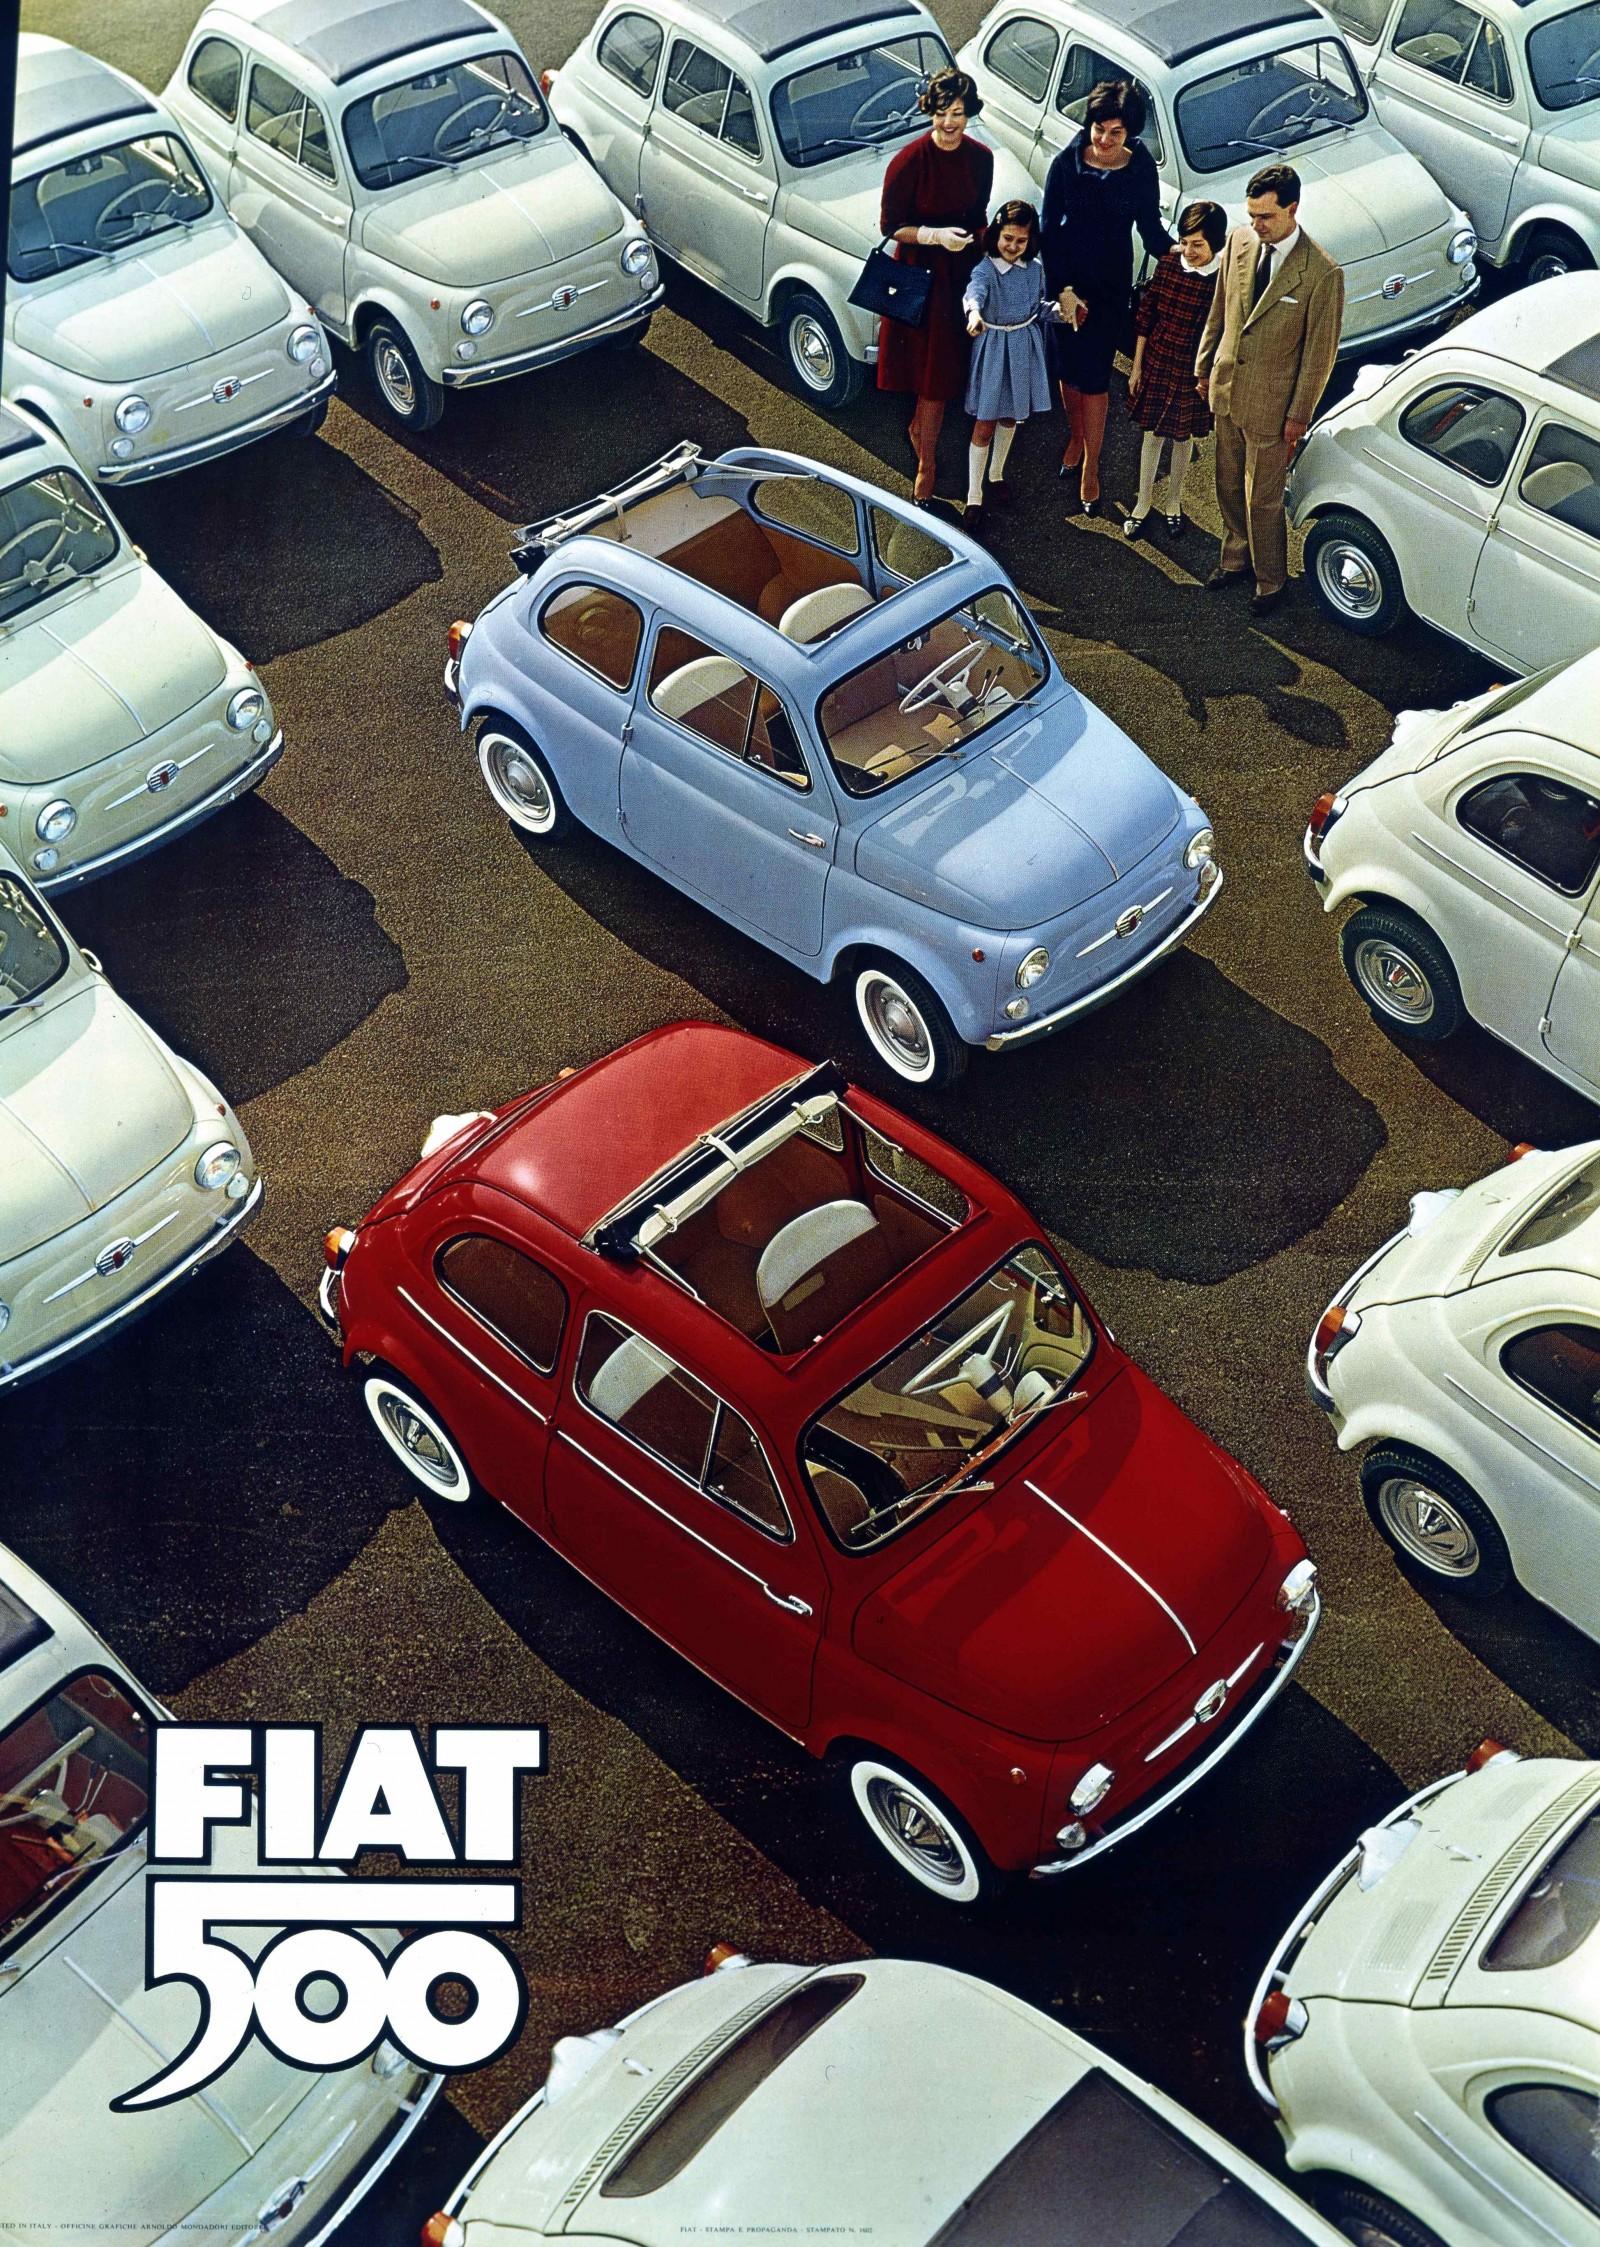 Fiat_500_Marketing_05